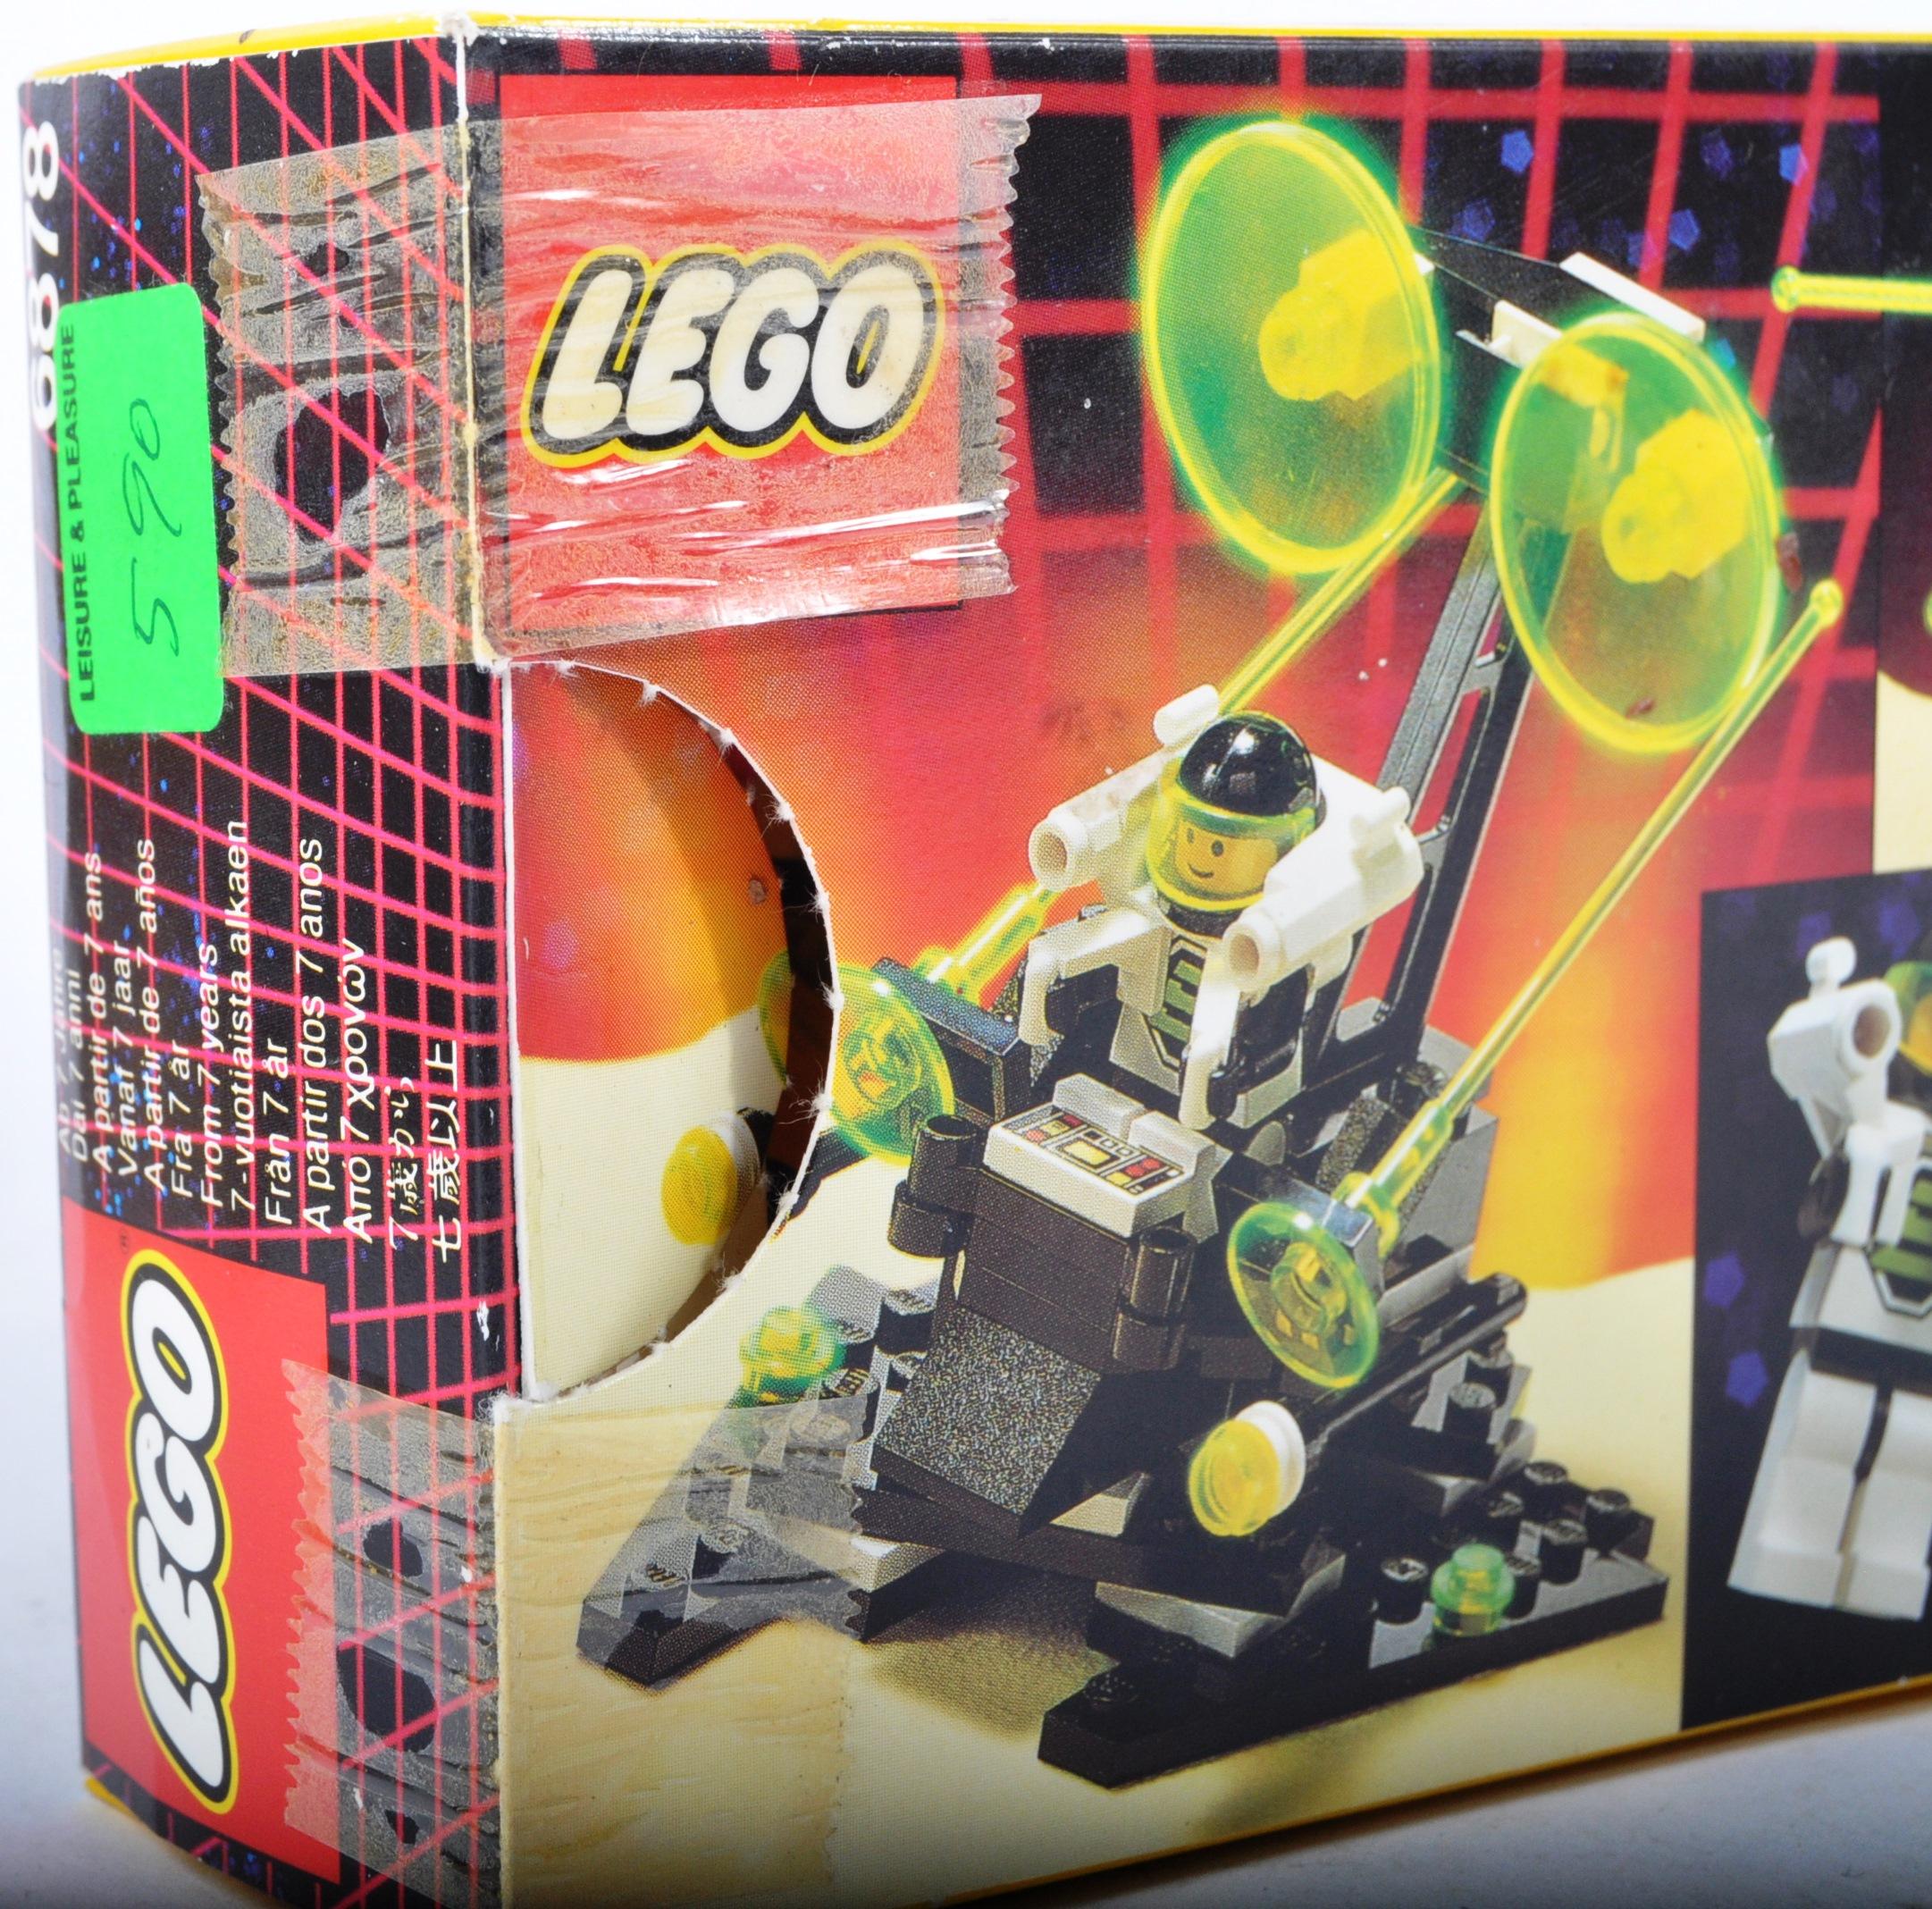 LEGO SETS - BLACKTRON - 6832 / 6833 / 6851 / 6878 / 6887 - Image 7 of 10